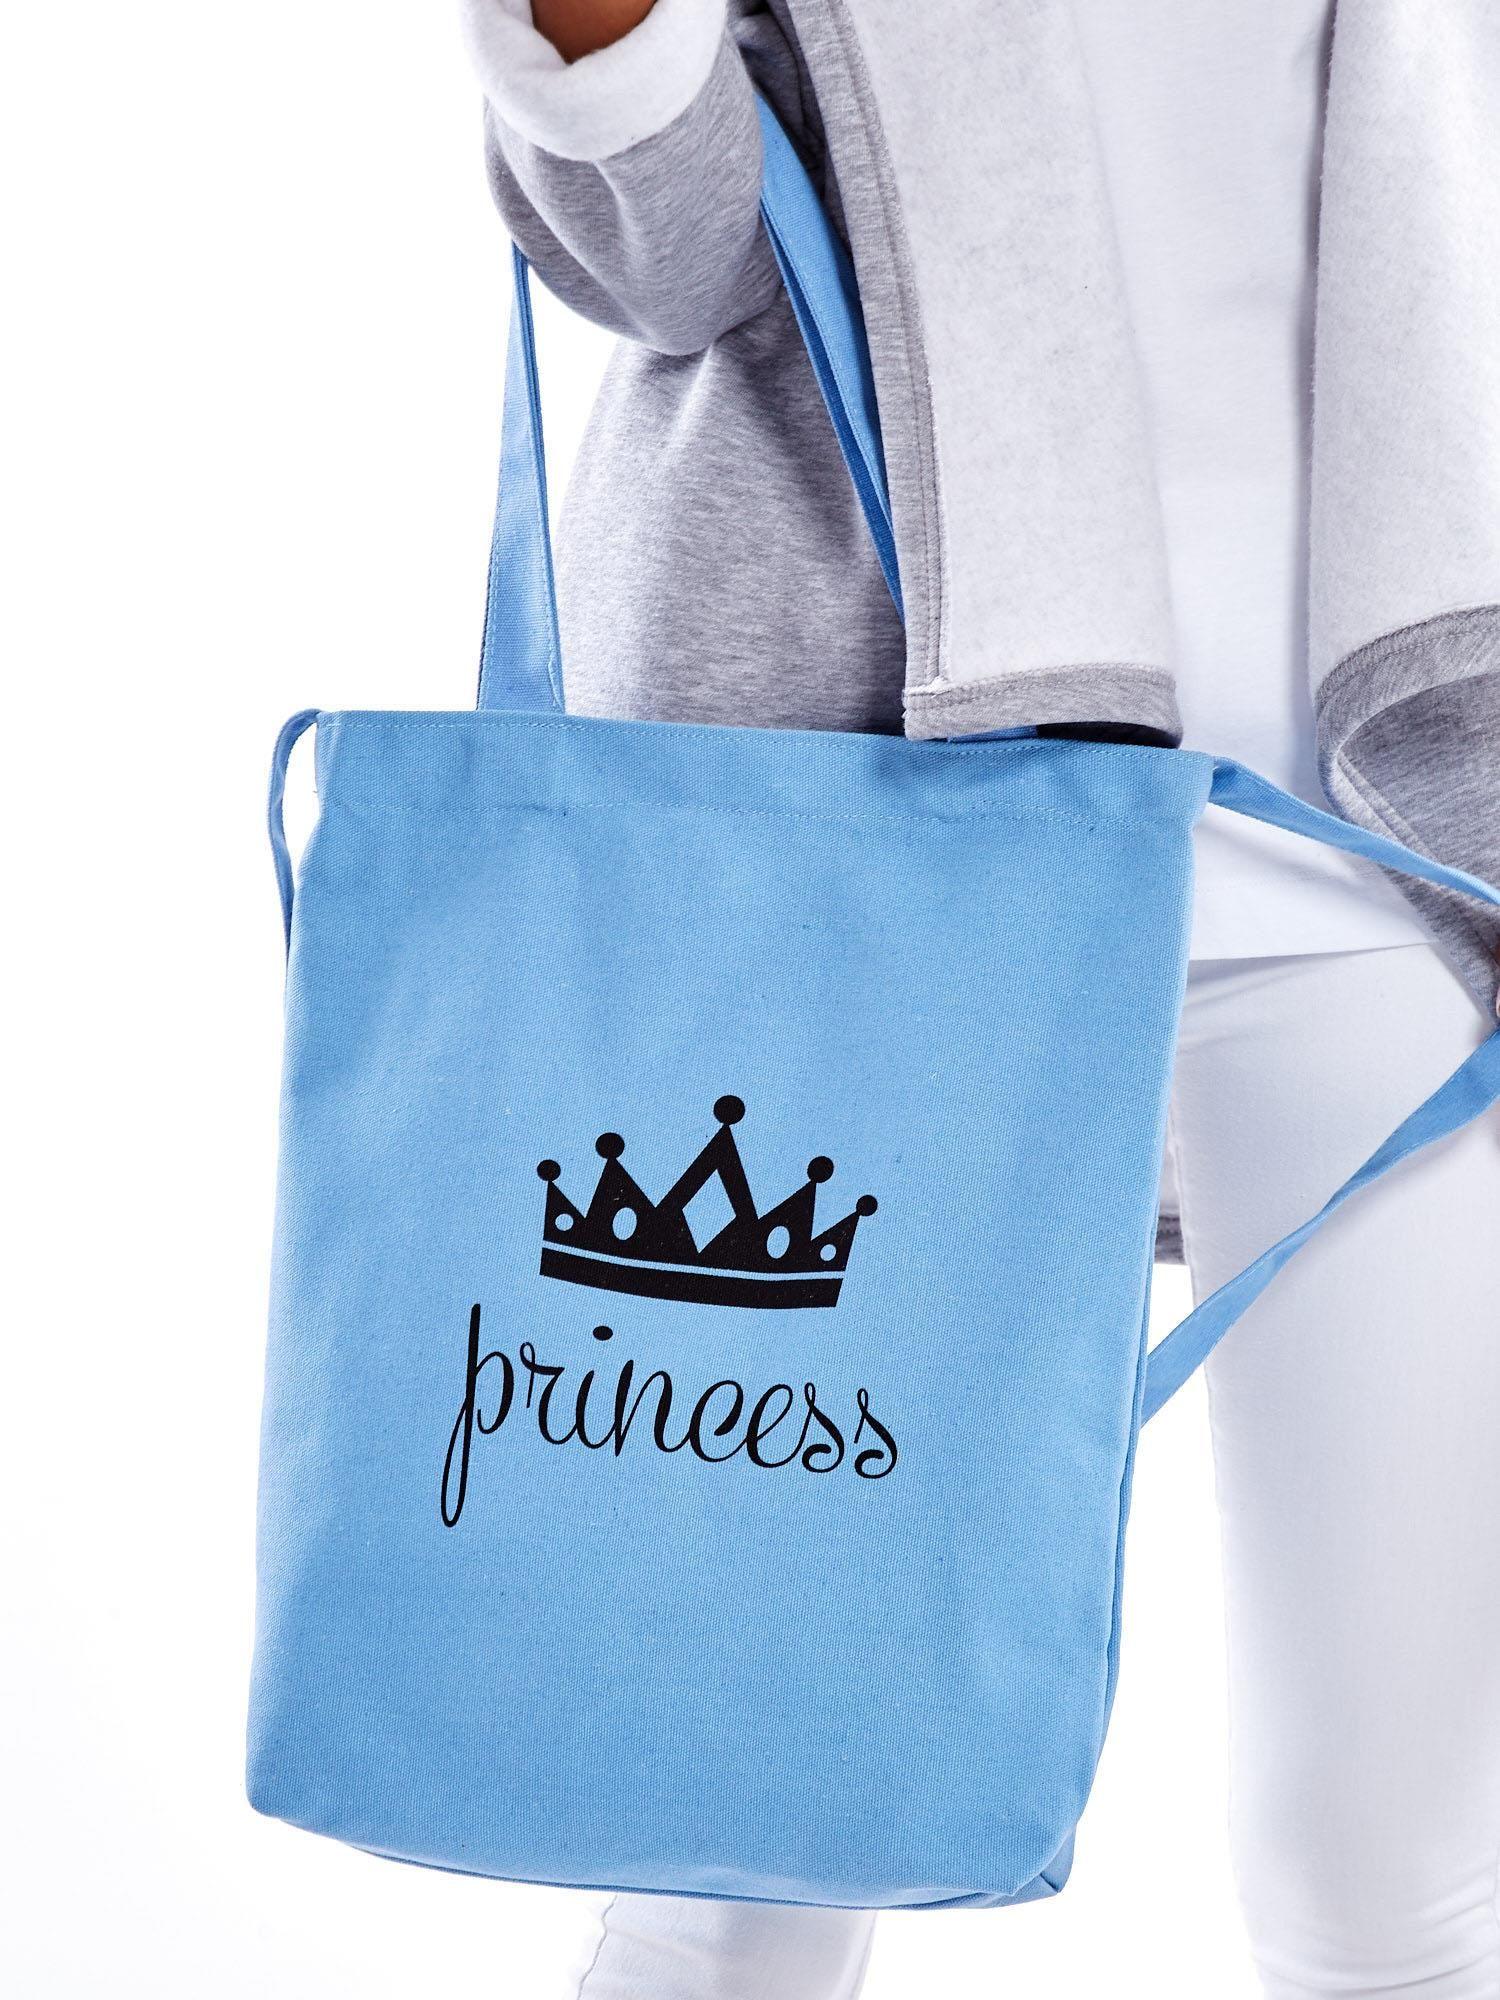 6b7e5ce2d1d26 Niebieska materiałowa torba z koroną PRINCESS - Akcesoria torba ...